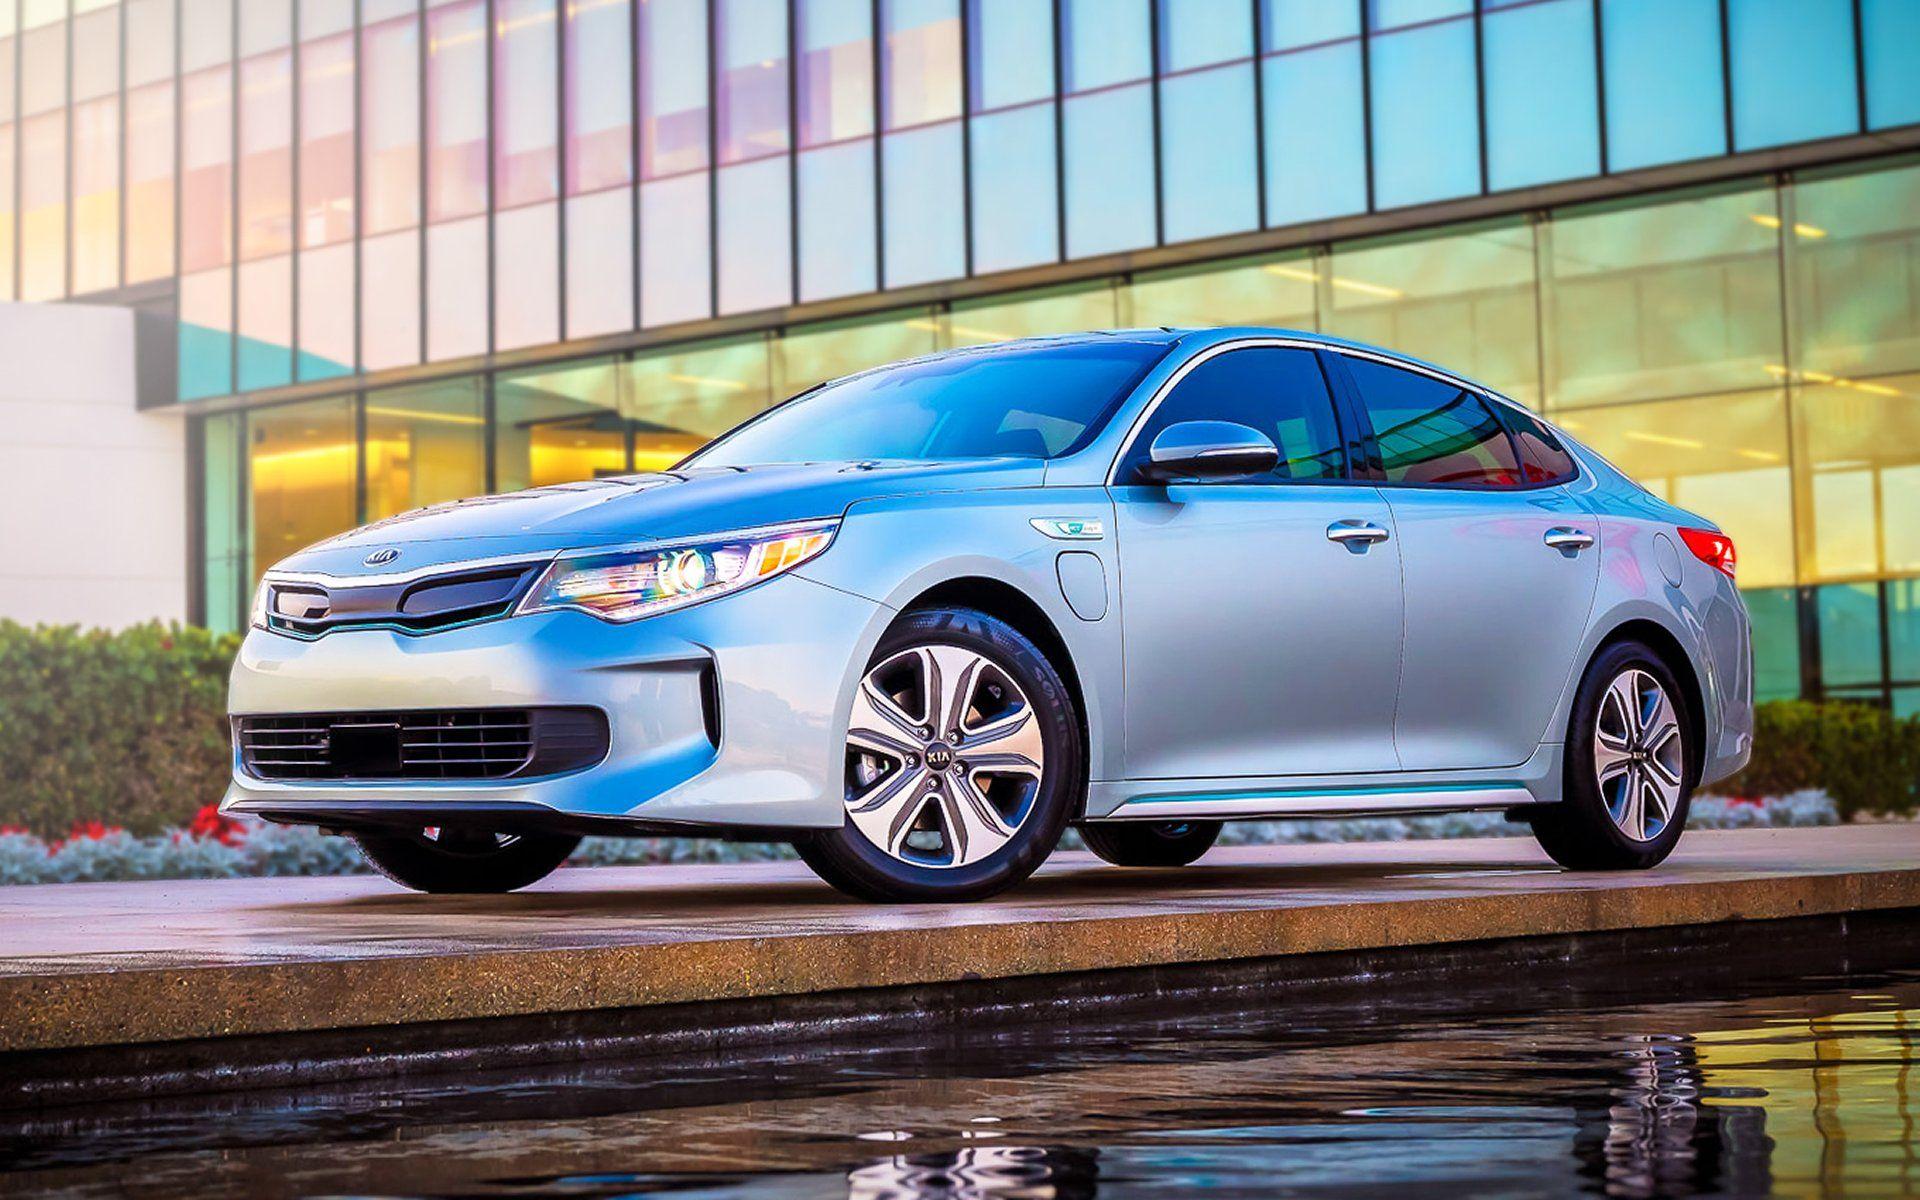 Get Electric With Two Hybrid Kia Optimas For 2017 Kia Optima Kia Kia Motors America